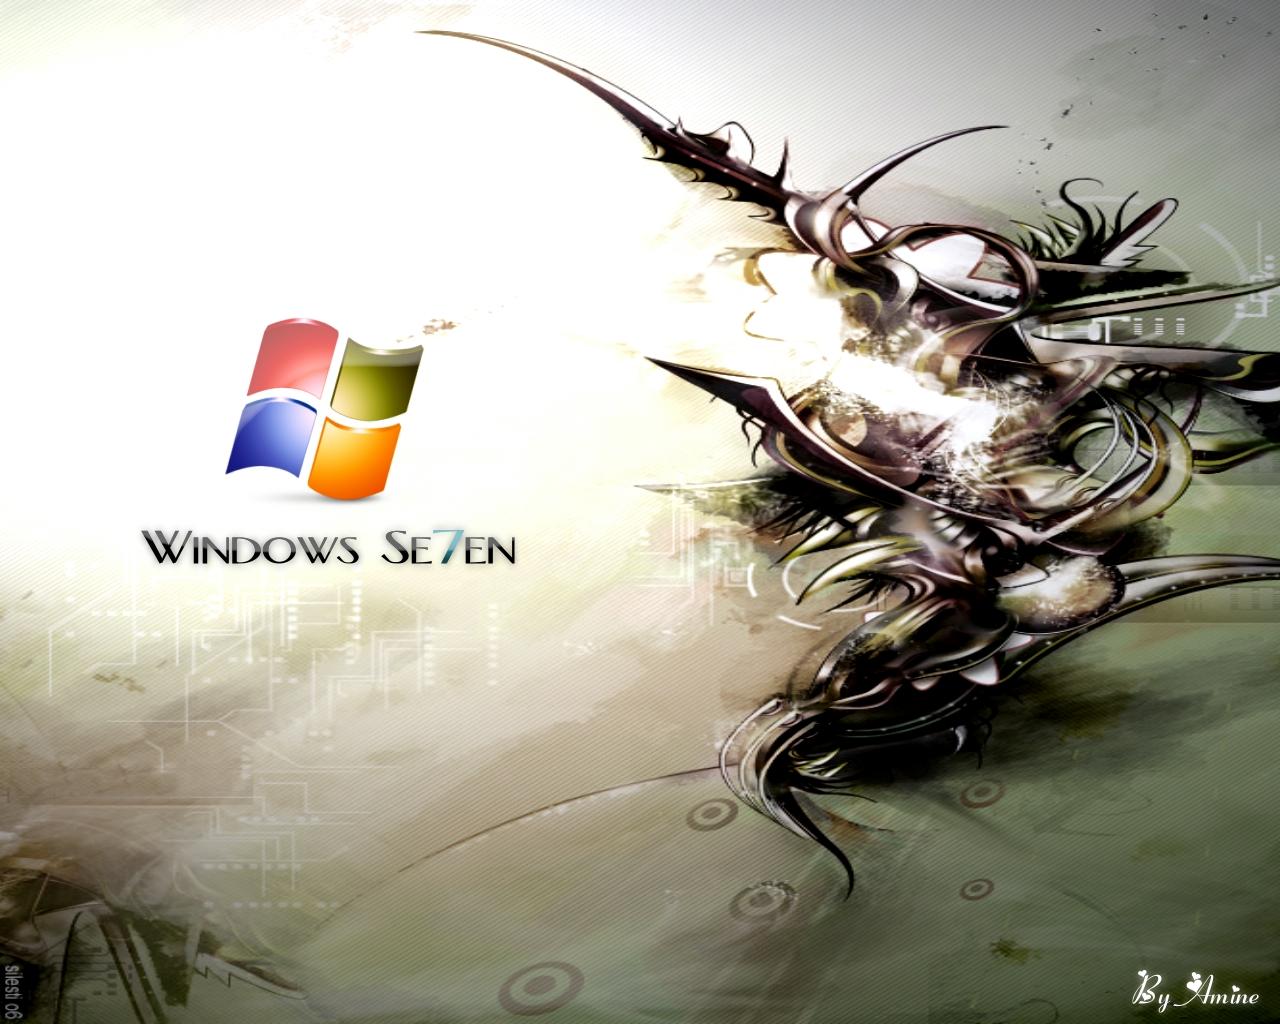 tips mempercepat kinerja windows 7 | iYu NaQ BoYaN